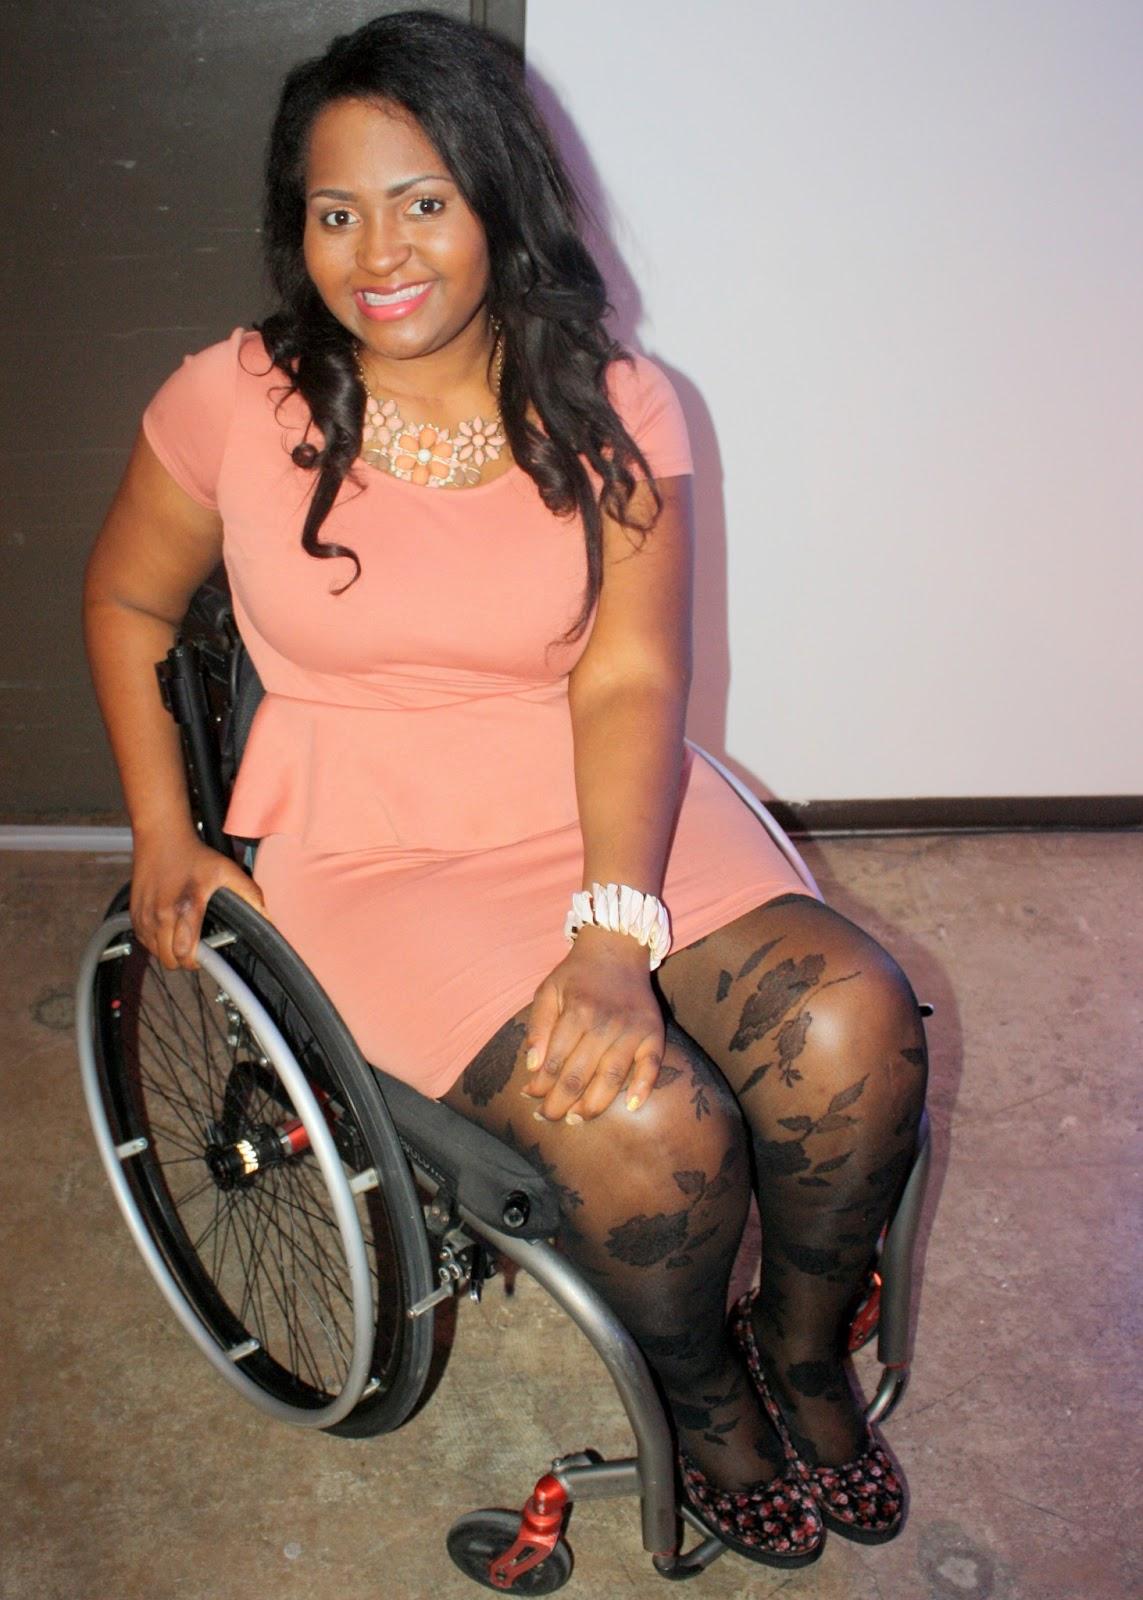 Free porn wheelchair woman, video gay sex meth orgy